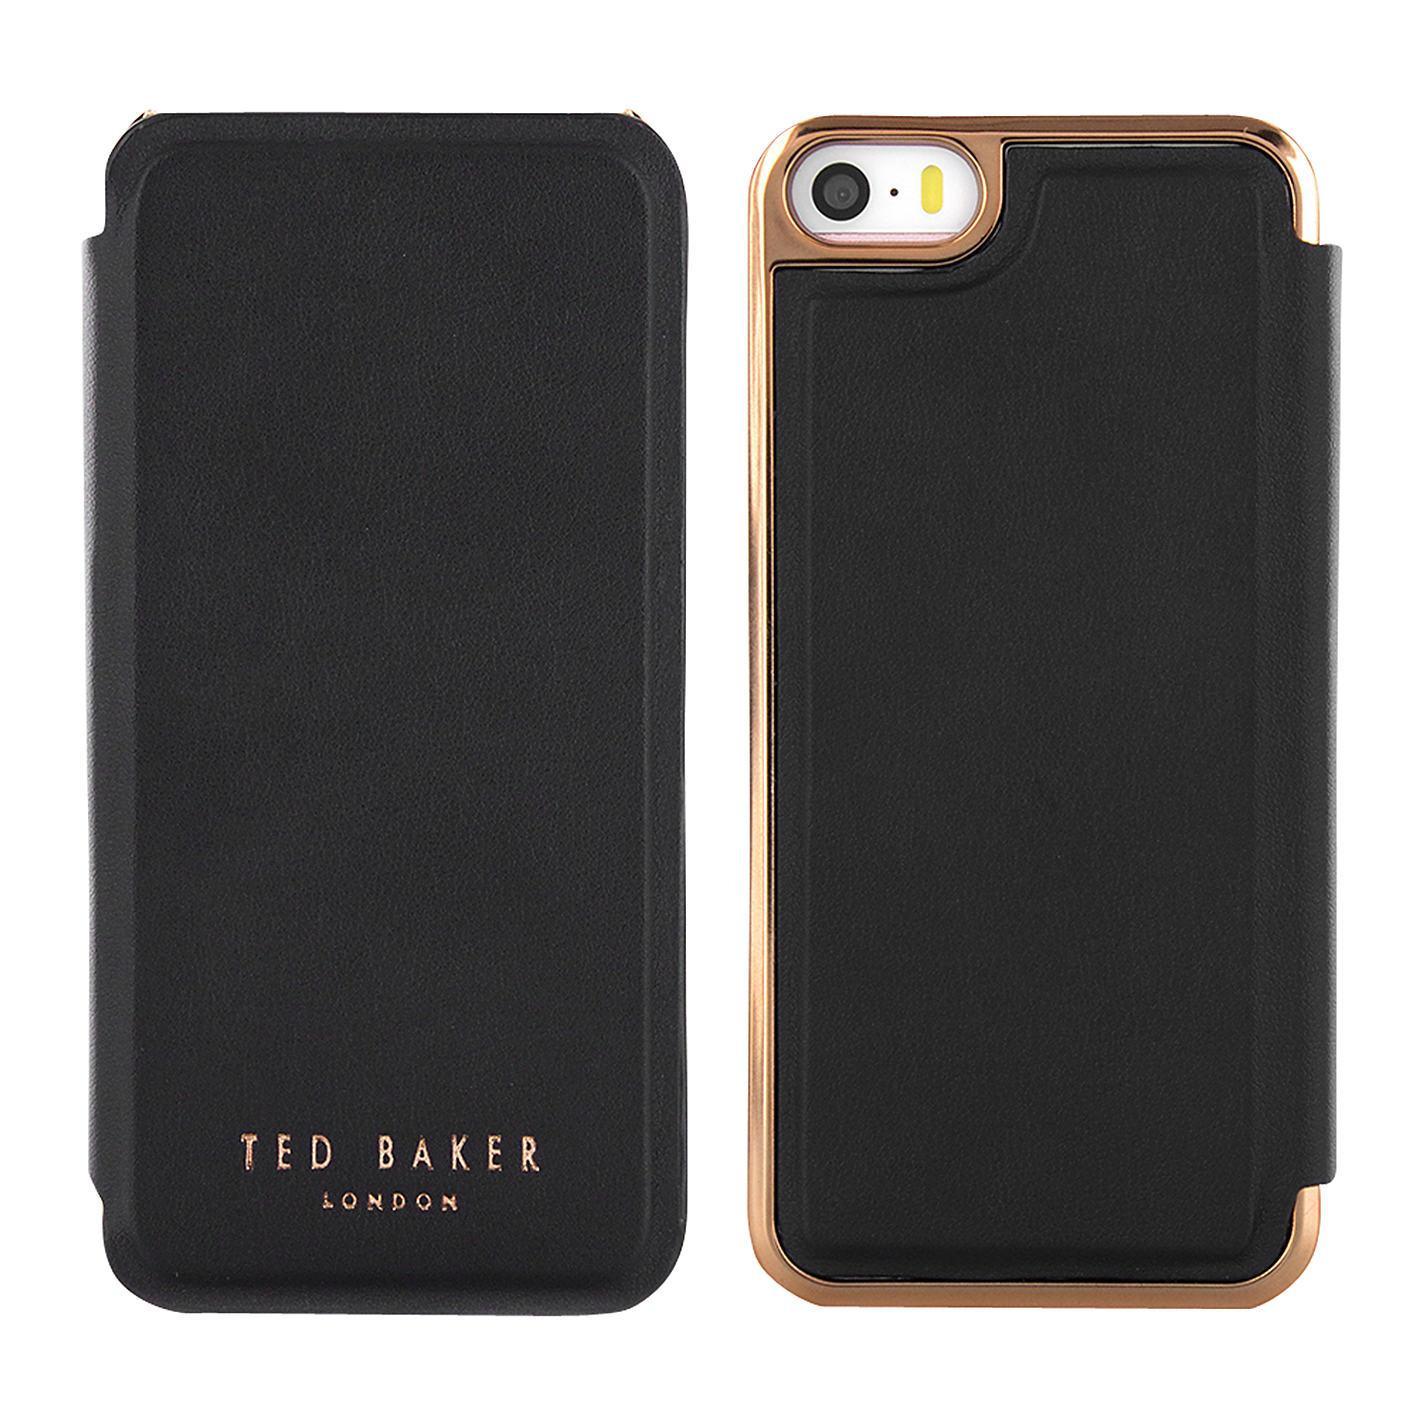 6094279cb1c22 Buy Ted Baker Shannon Case for iPhone SE Online at johnlewis.com